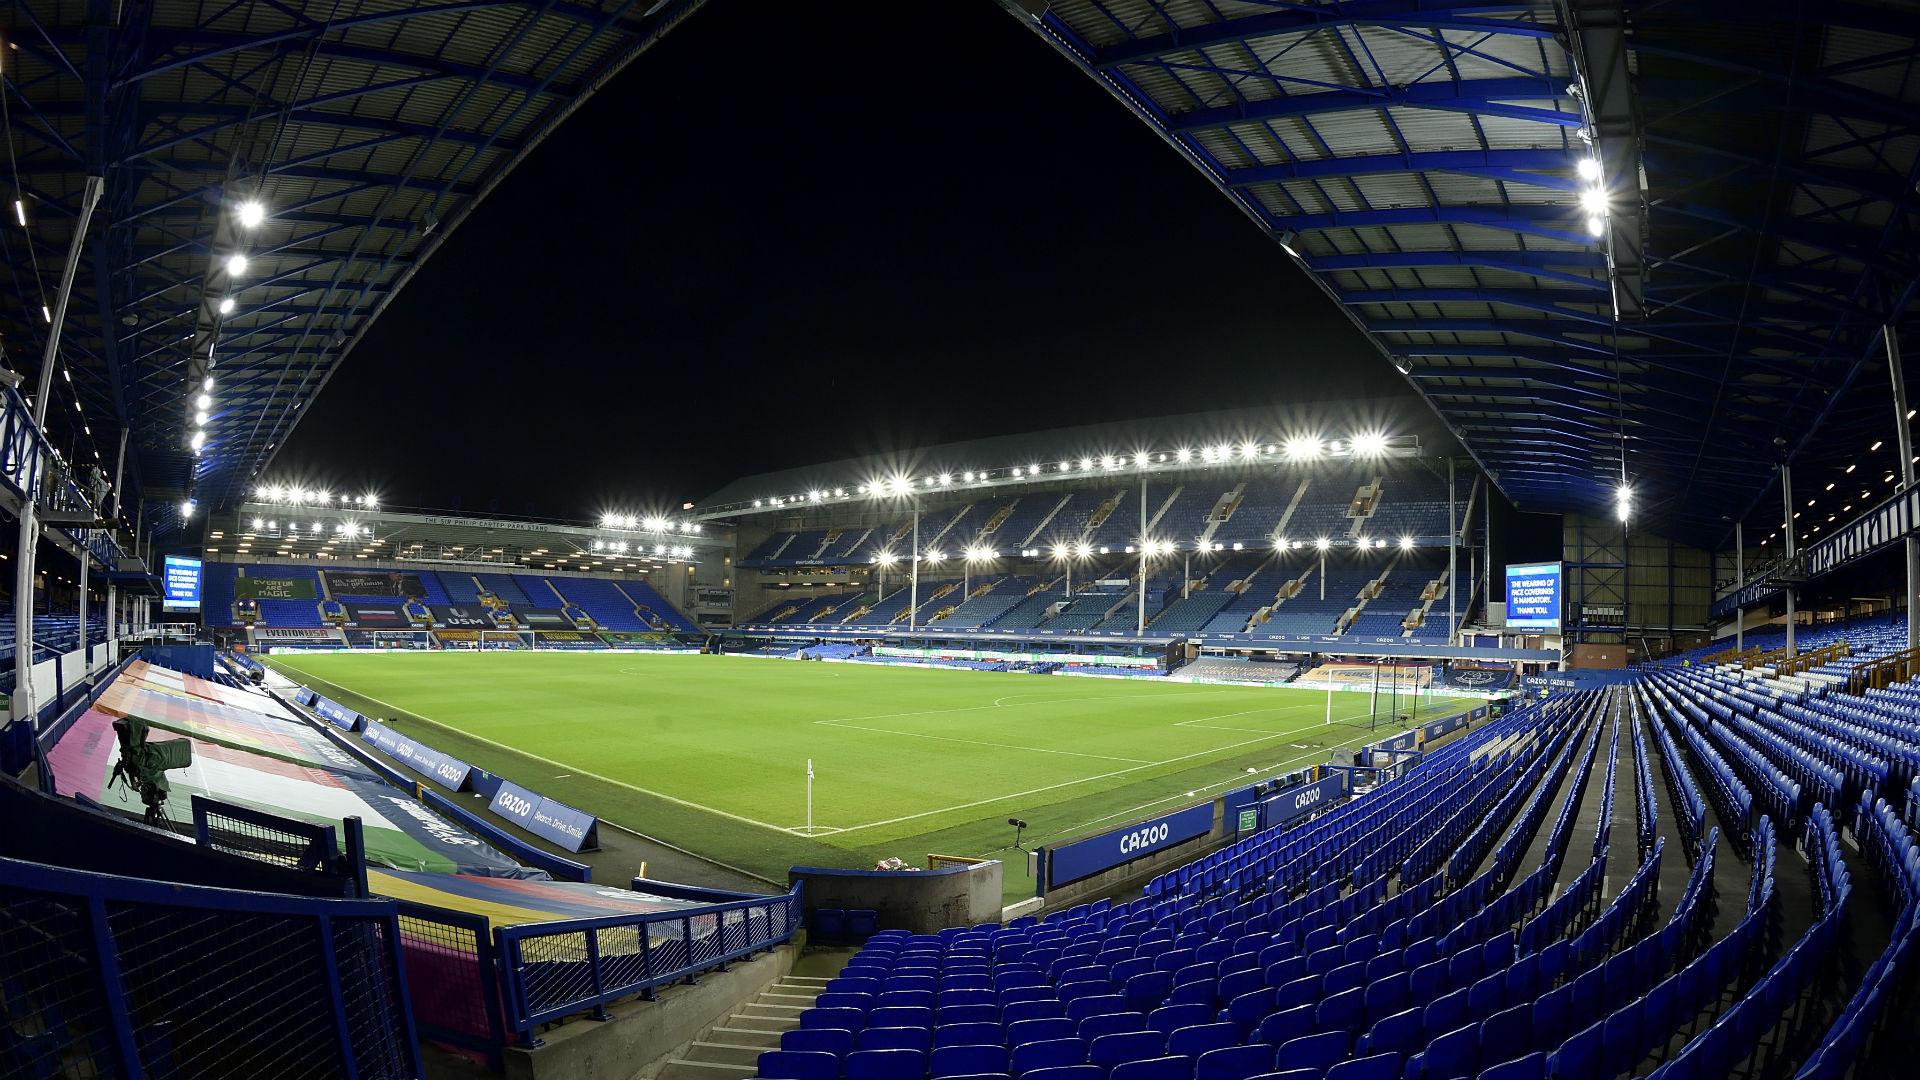 Everton v Man City postponed due to new coronavirus cases